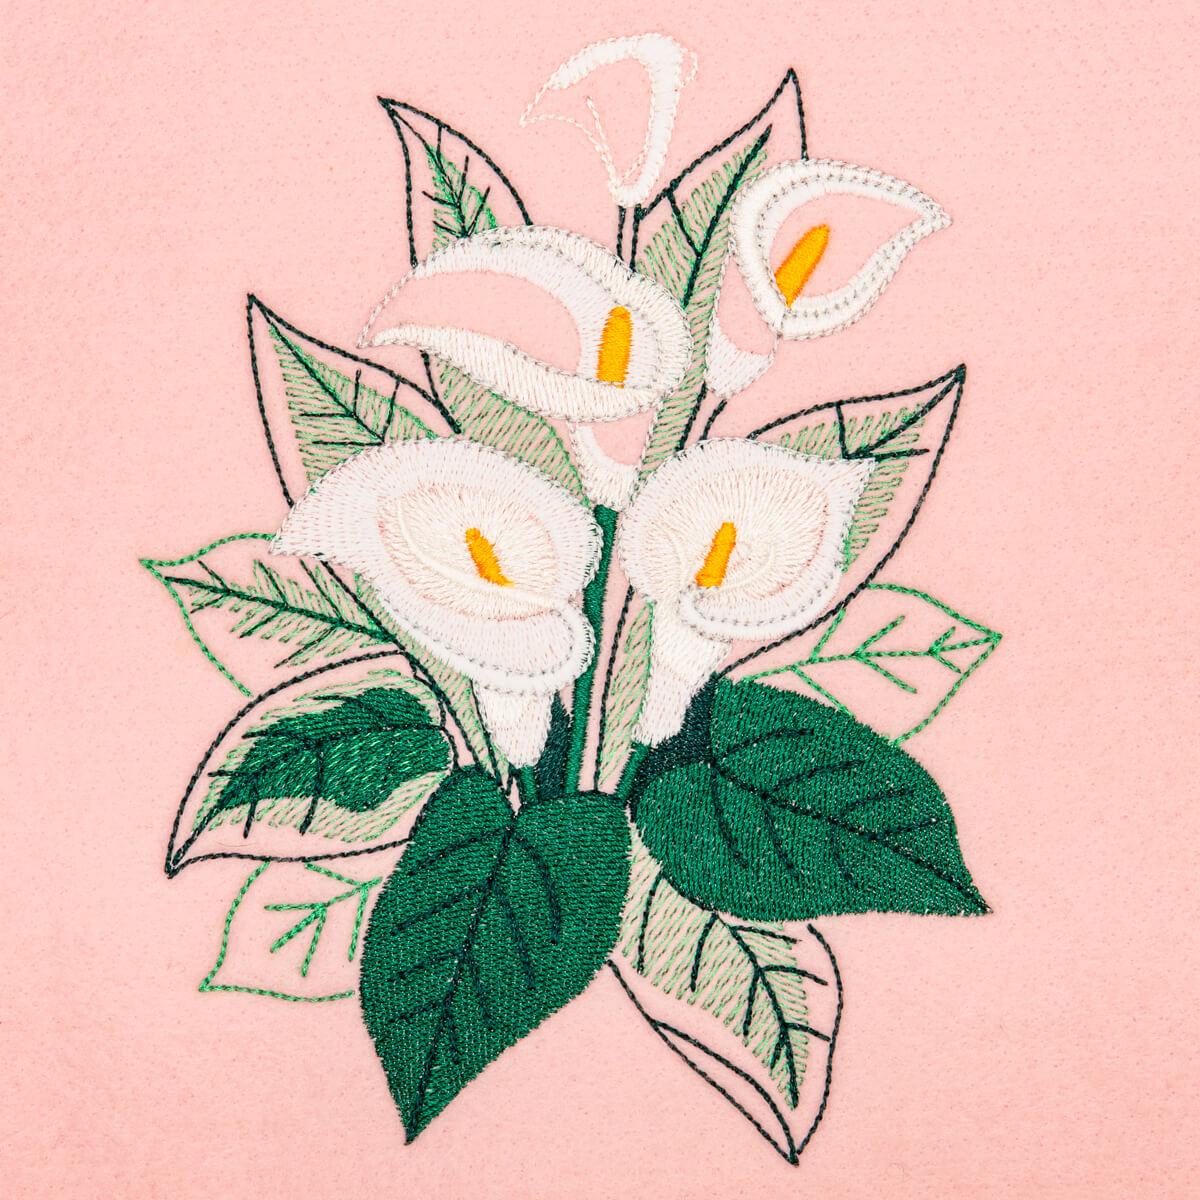 Matriz de bordado floral 547